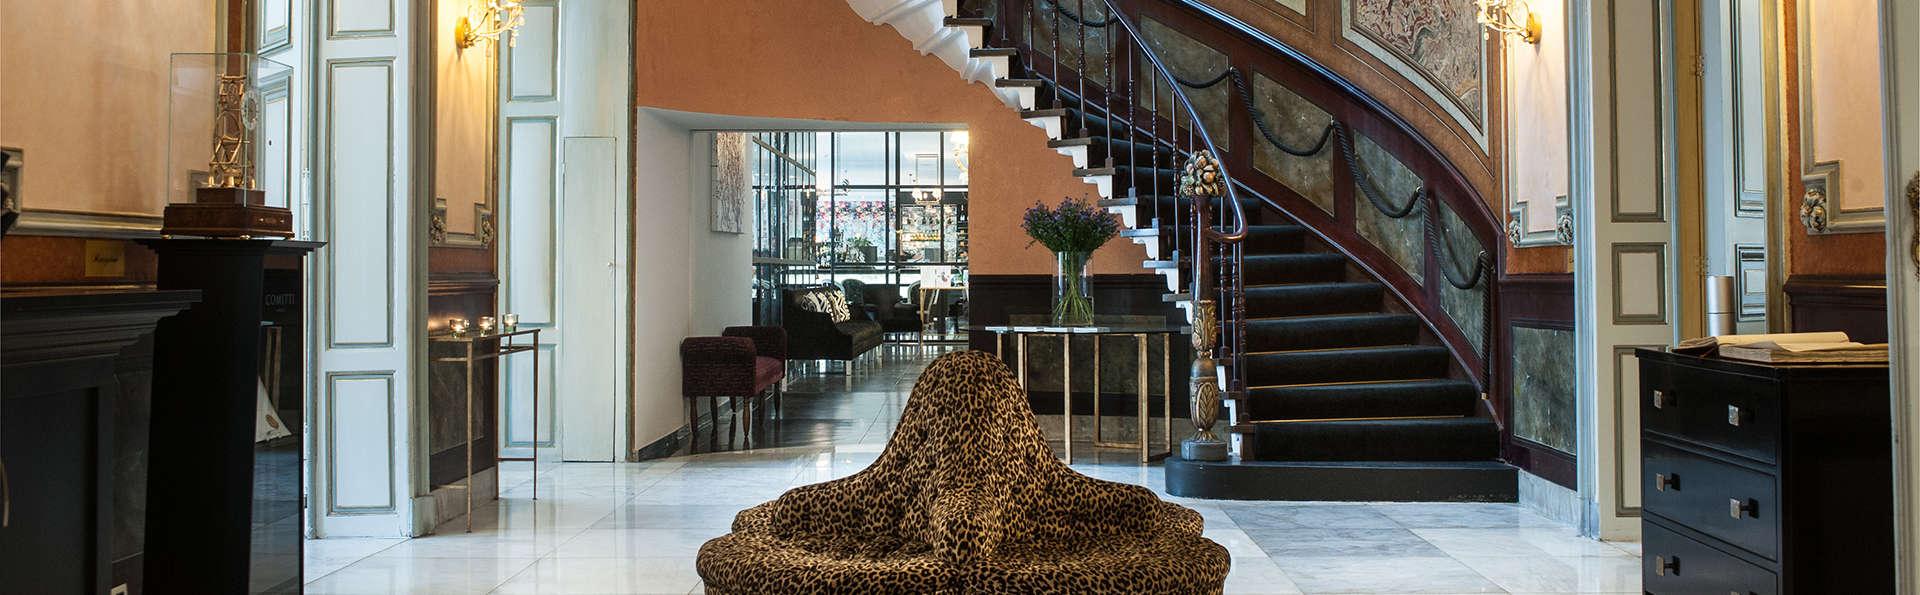 Sandton Grand Hotel Reylof Gent - EDIT_hall2.jpg